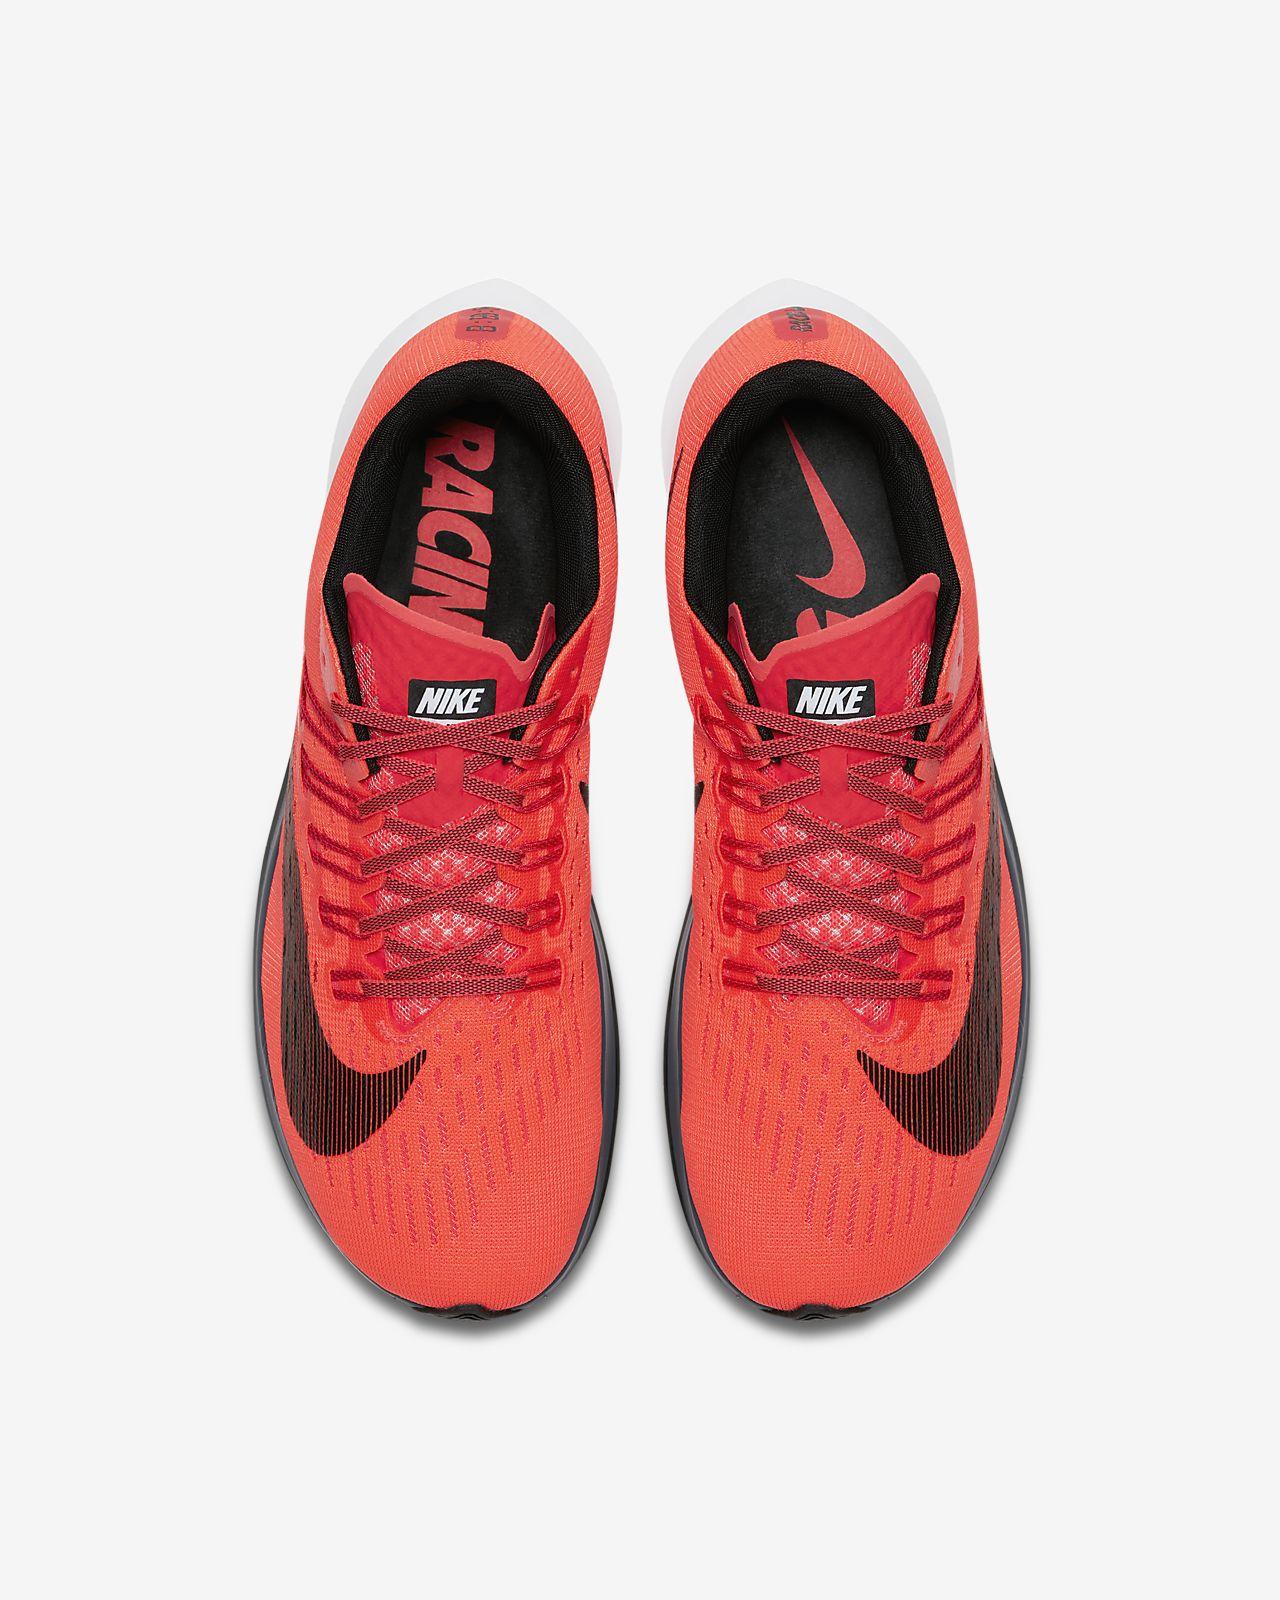 22f498b560753 Low Resolution Nike Zoom Fly Men s Running Shoe Nike Zoom Fly Men s Running  Shoe